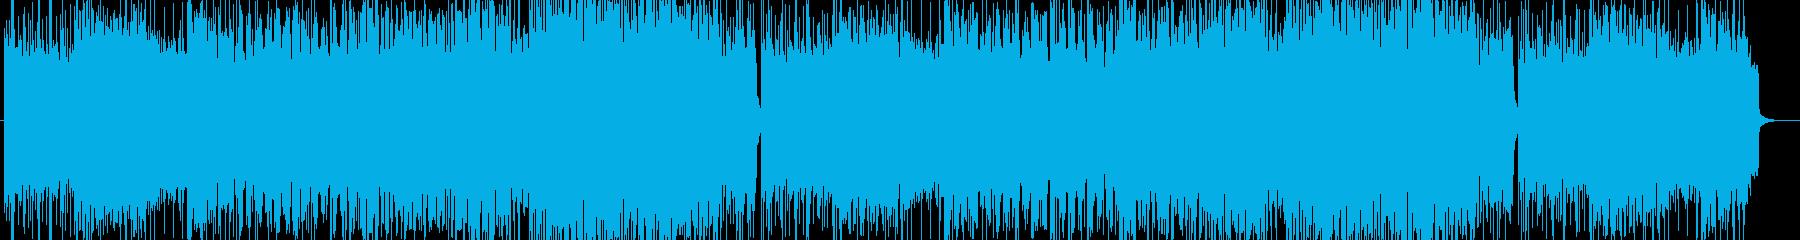 「HR/HM」「DARK」BGM82の再生済みの波形